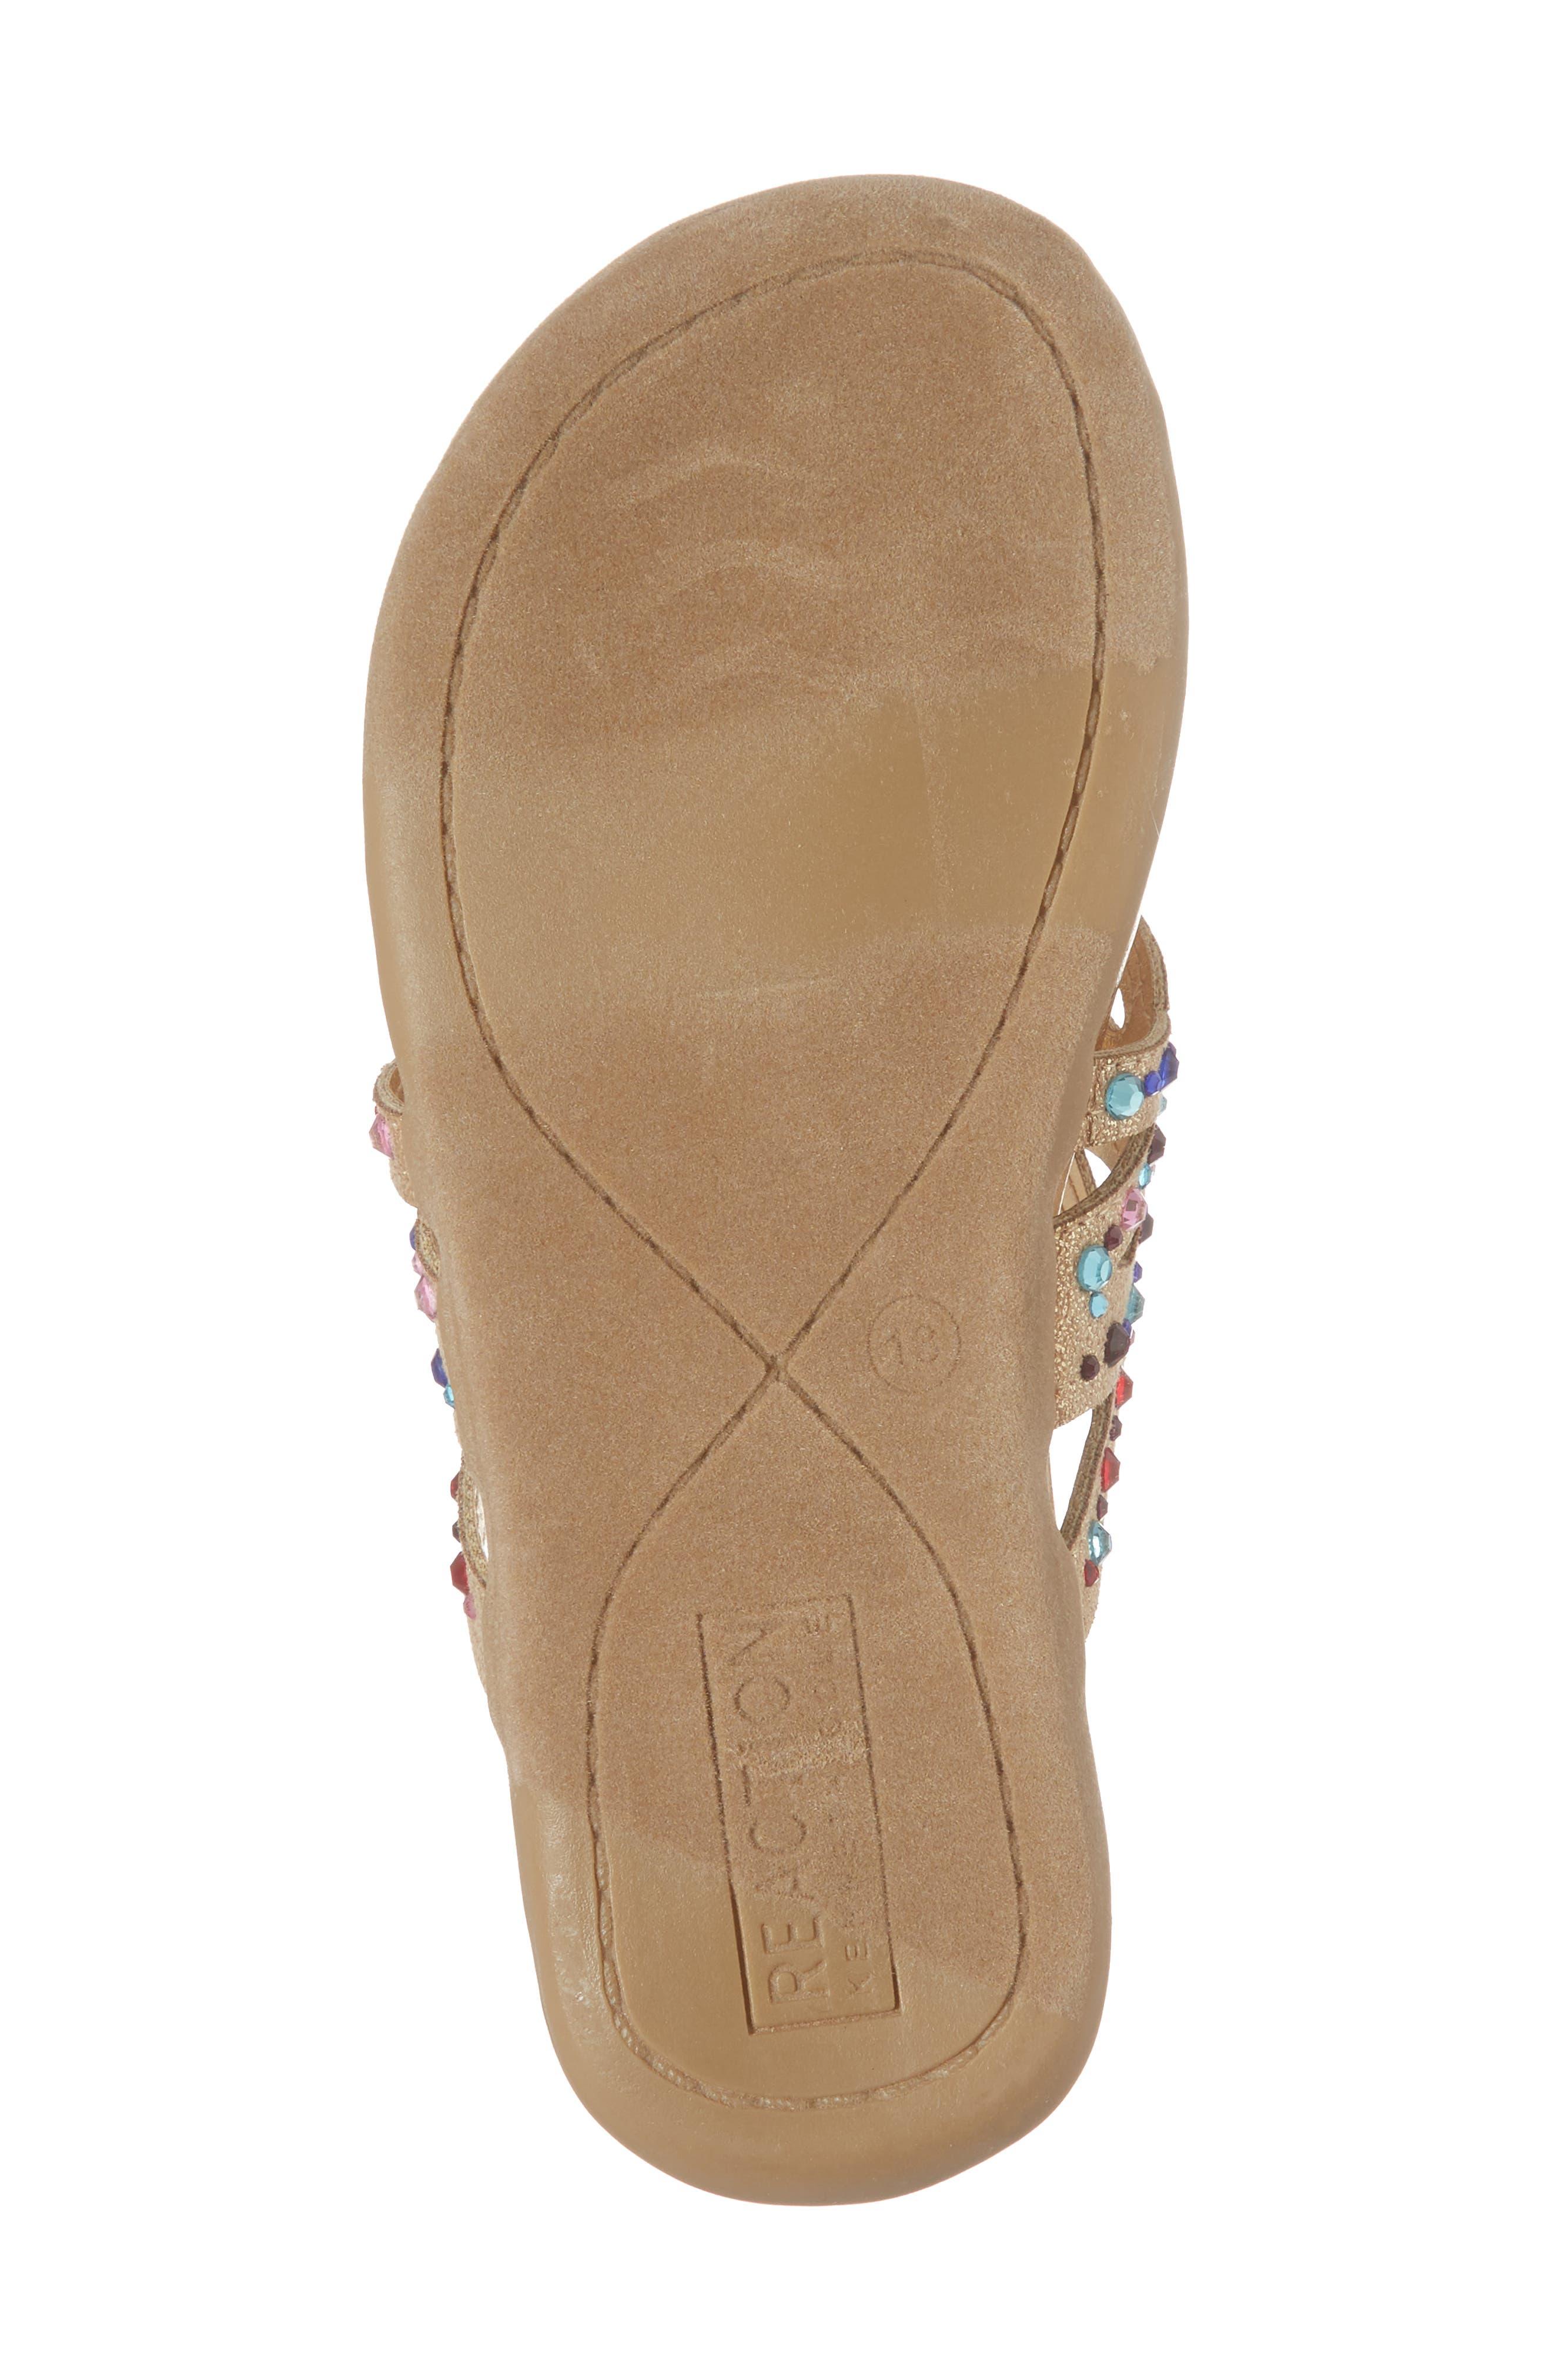 Kenneth Cole New York Flutter Metallic Crystal Thong Sandal,                             Alternate thumbnail 6, color,                             GOLD MULTI